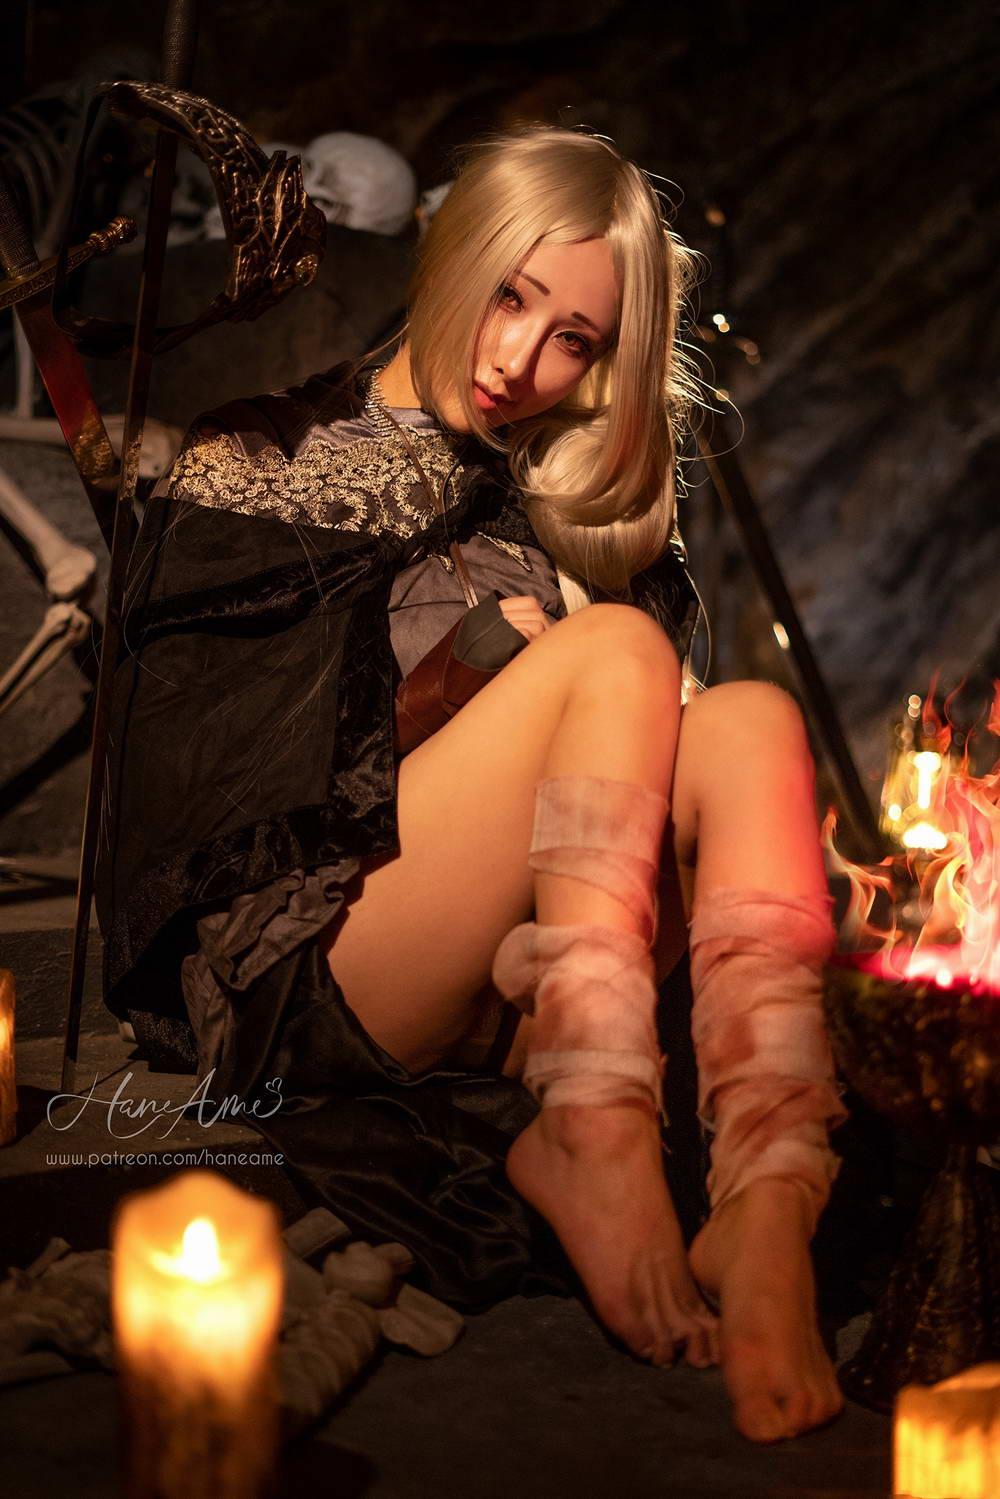 HaneAme雨波 – DaekSoul3 Fire_Keeper [/265MB]